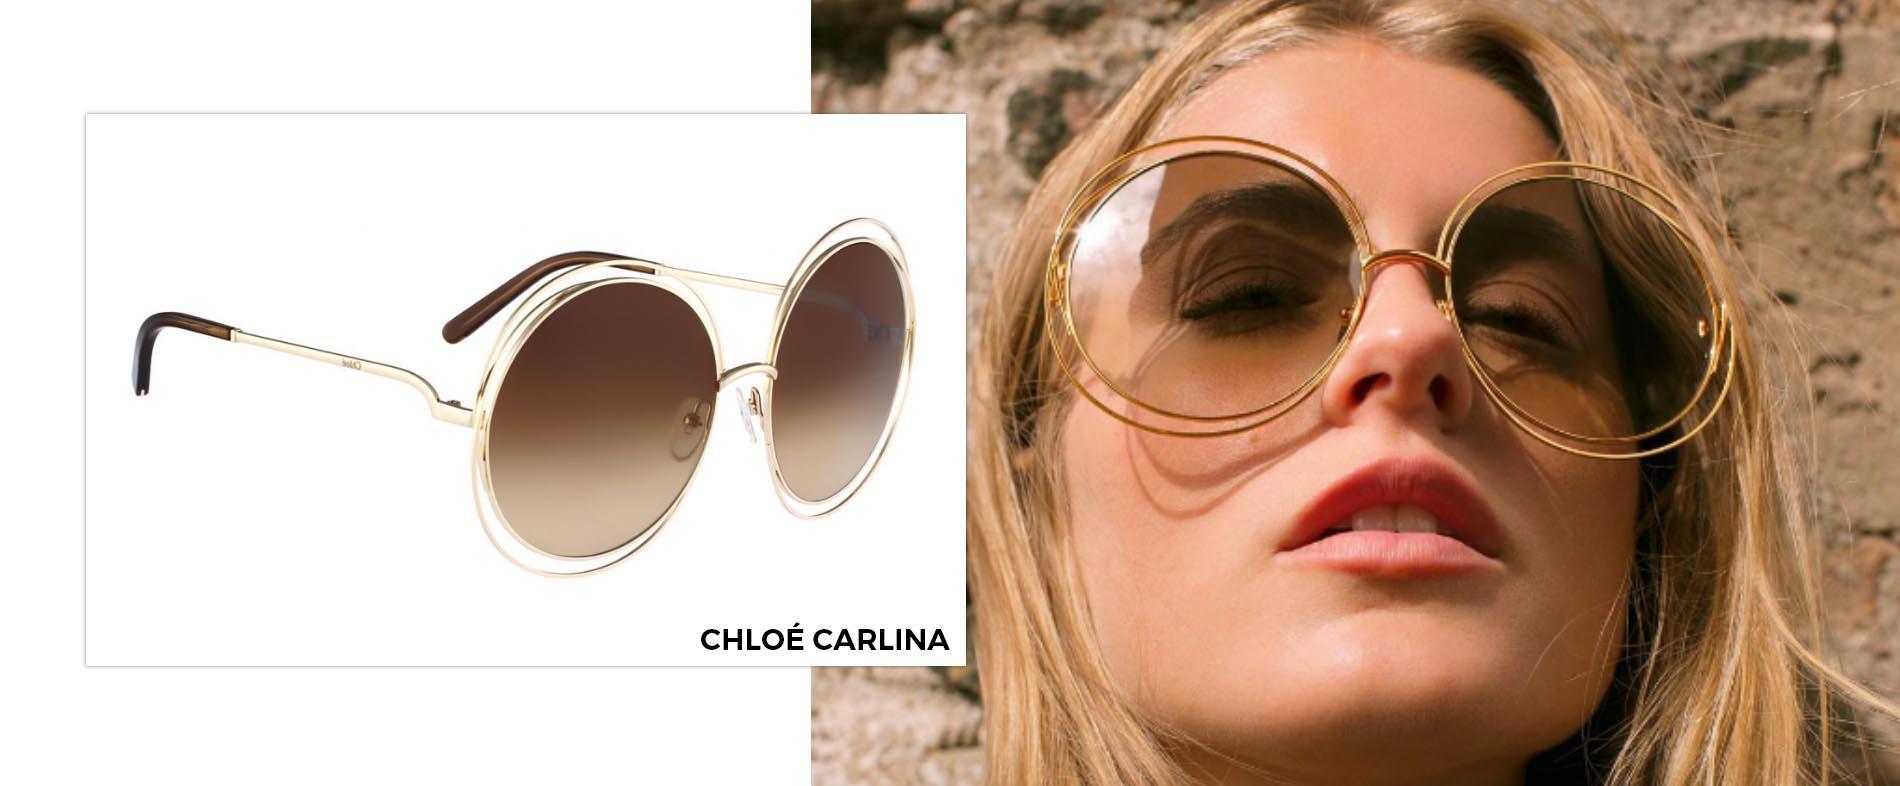 f470a6a267b16 Chloé Carlina CE114S 784 6218 Sunglasses €307.62 €242.56 ...